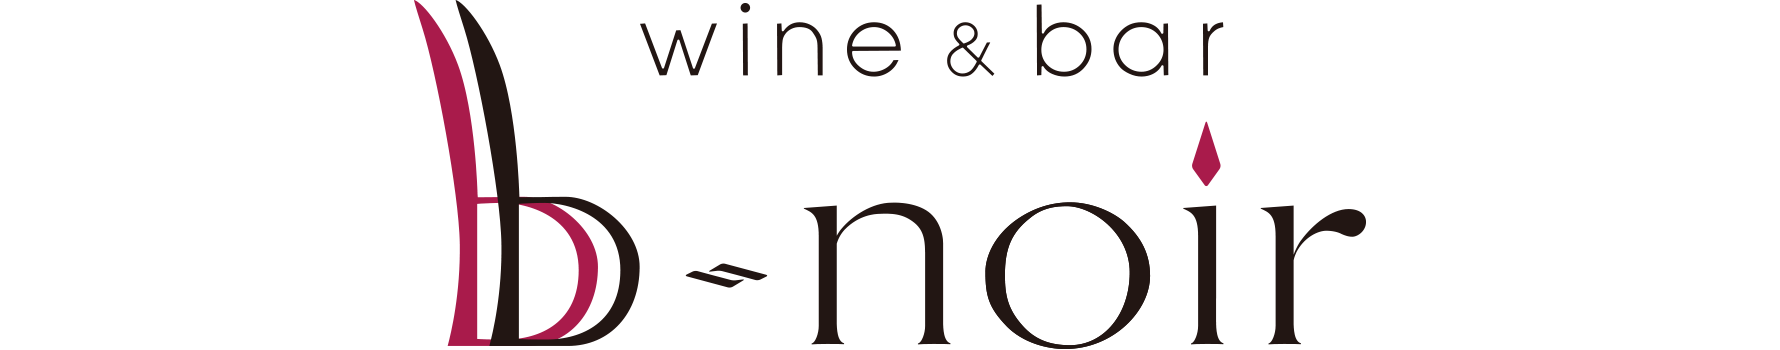 wine & bar b-noir【ビーノワール】(六本木)のロゴ